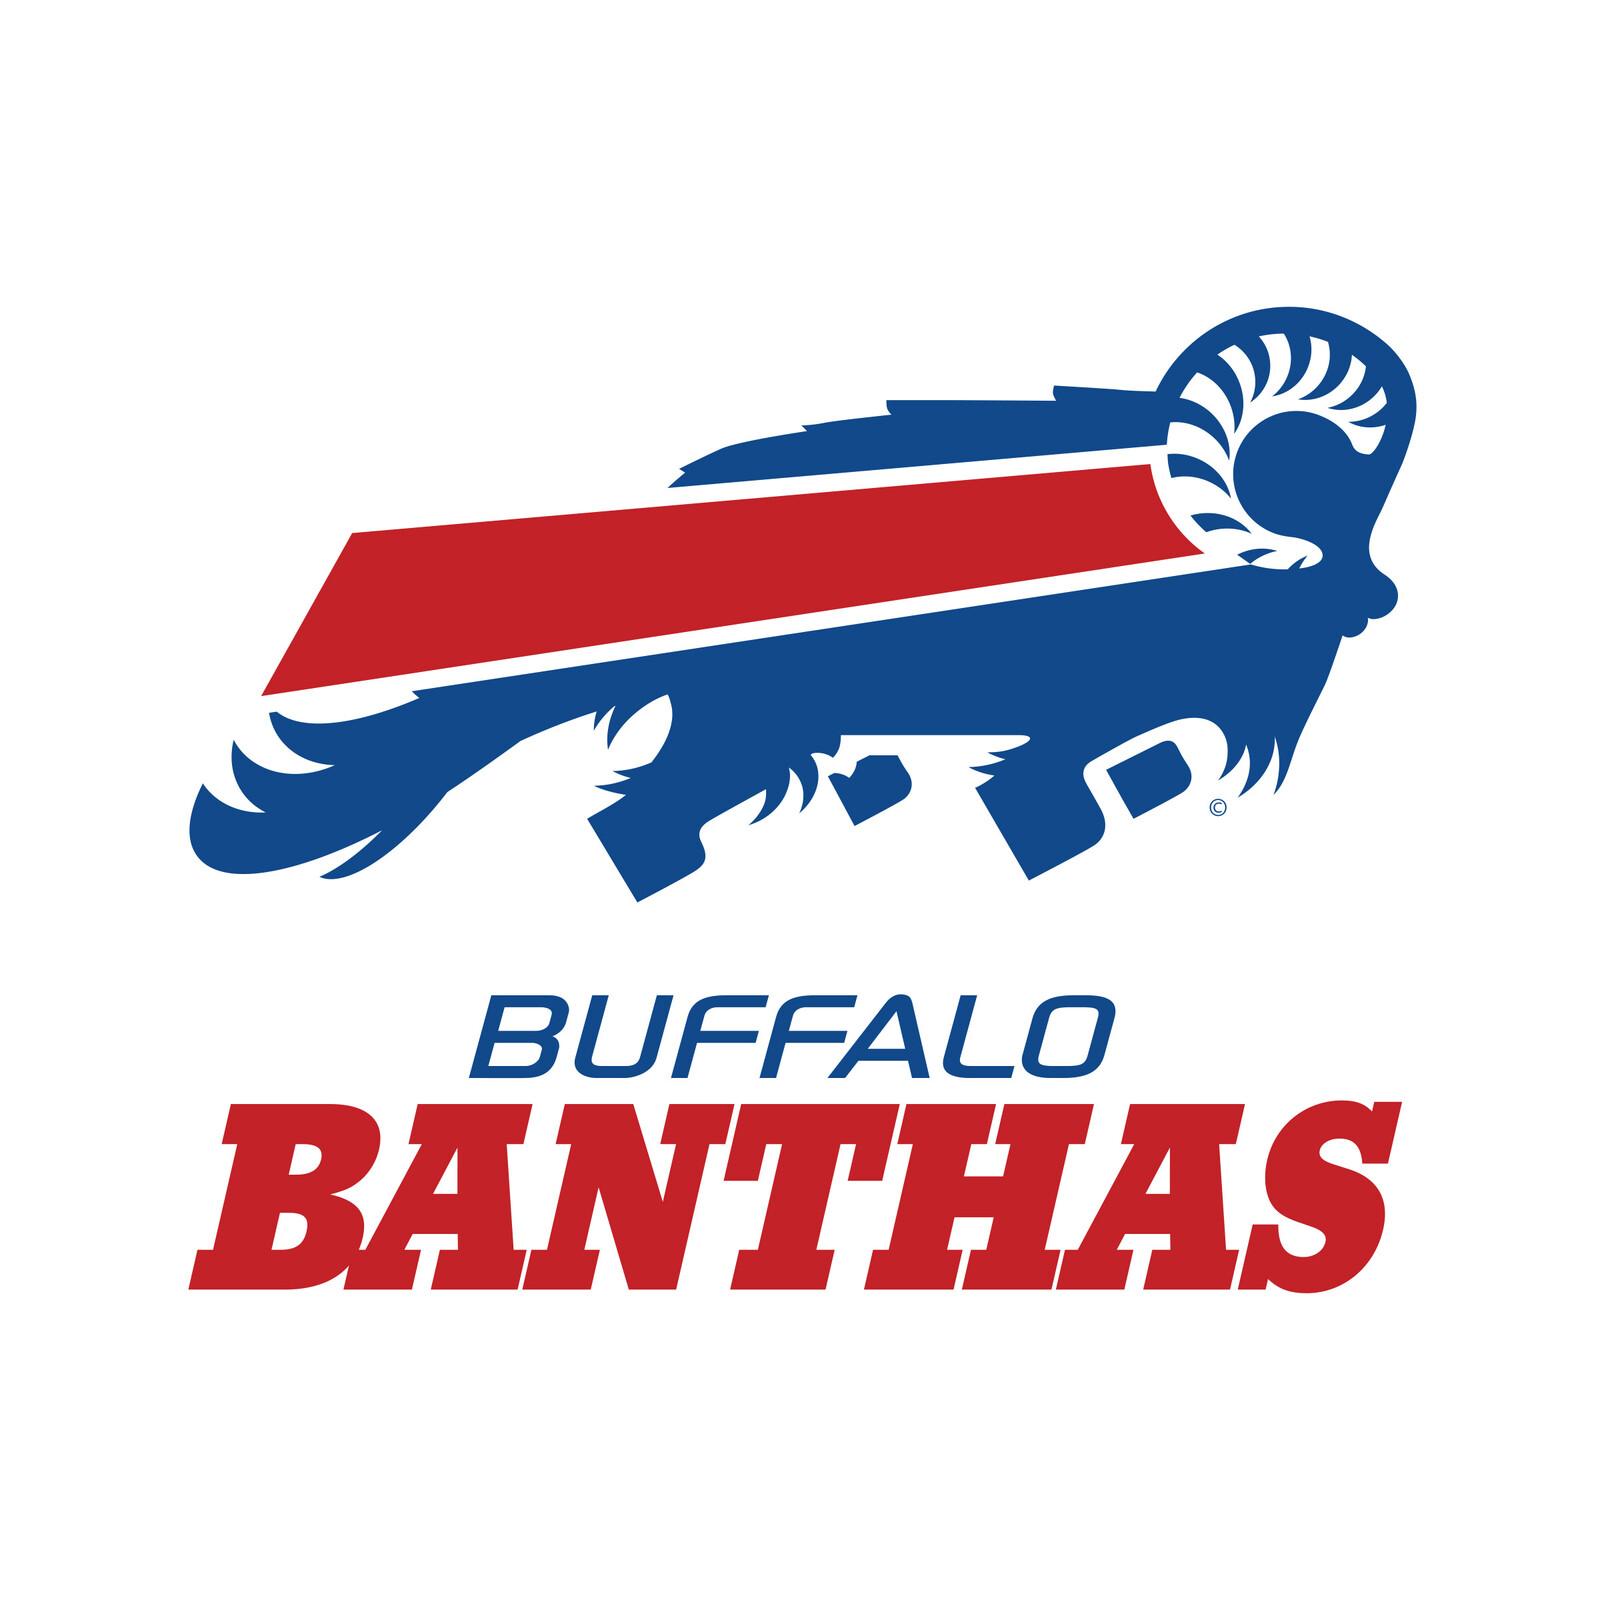 Buffalo Banthas